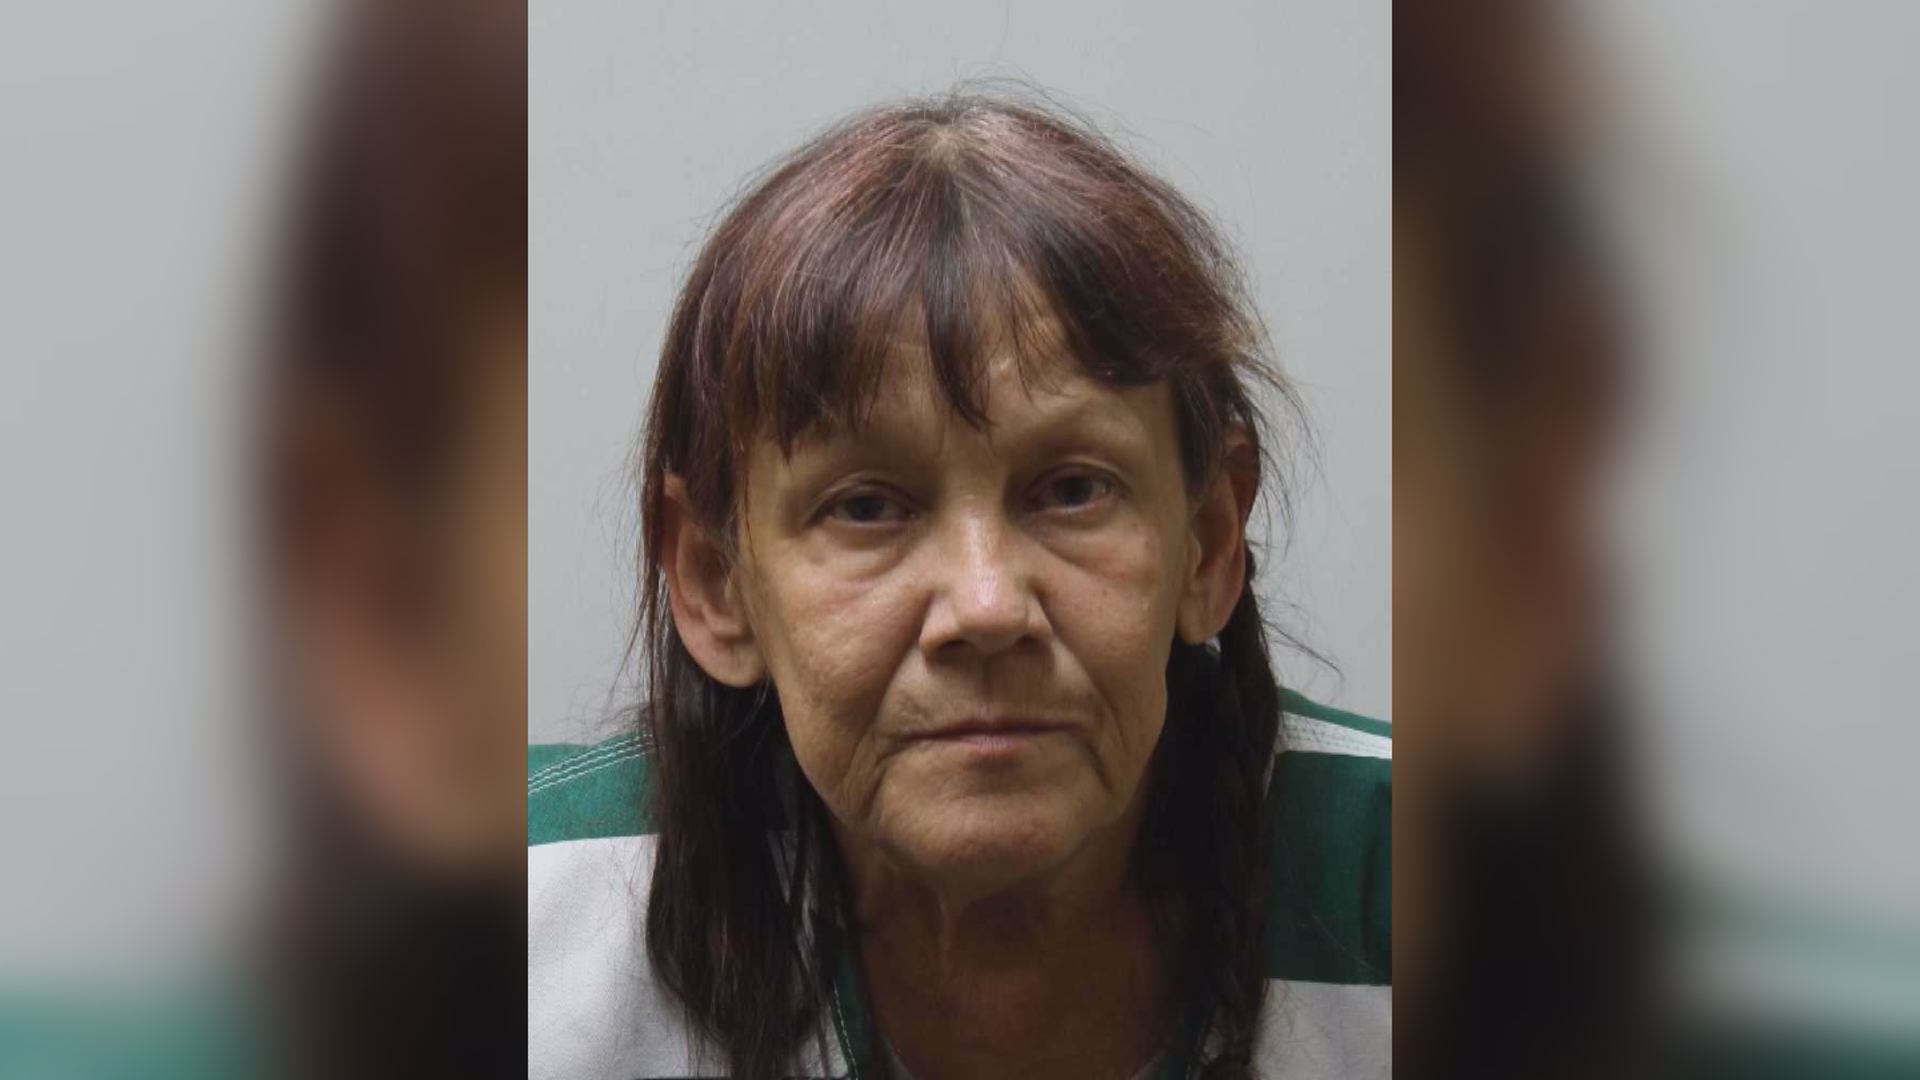 Schizophrenic Florida mom kills 6-year-old son then goes